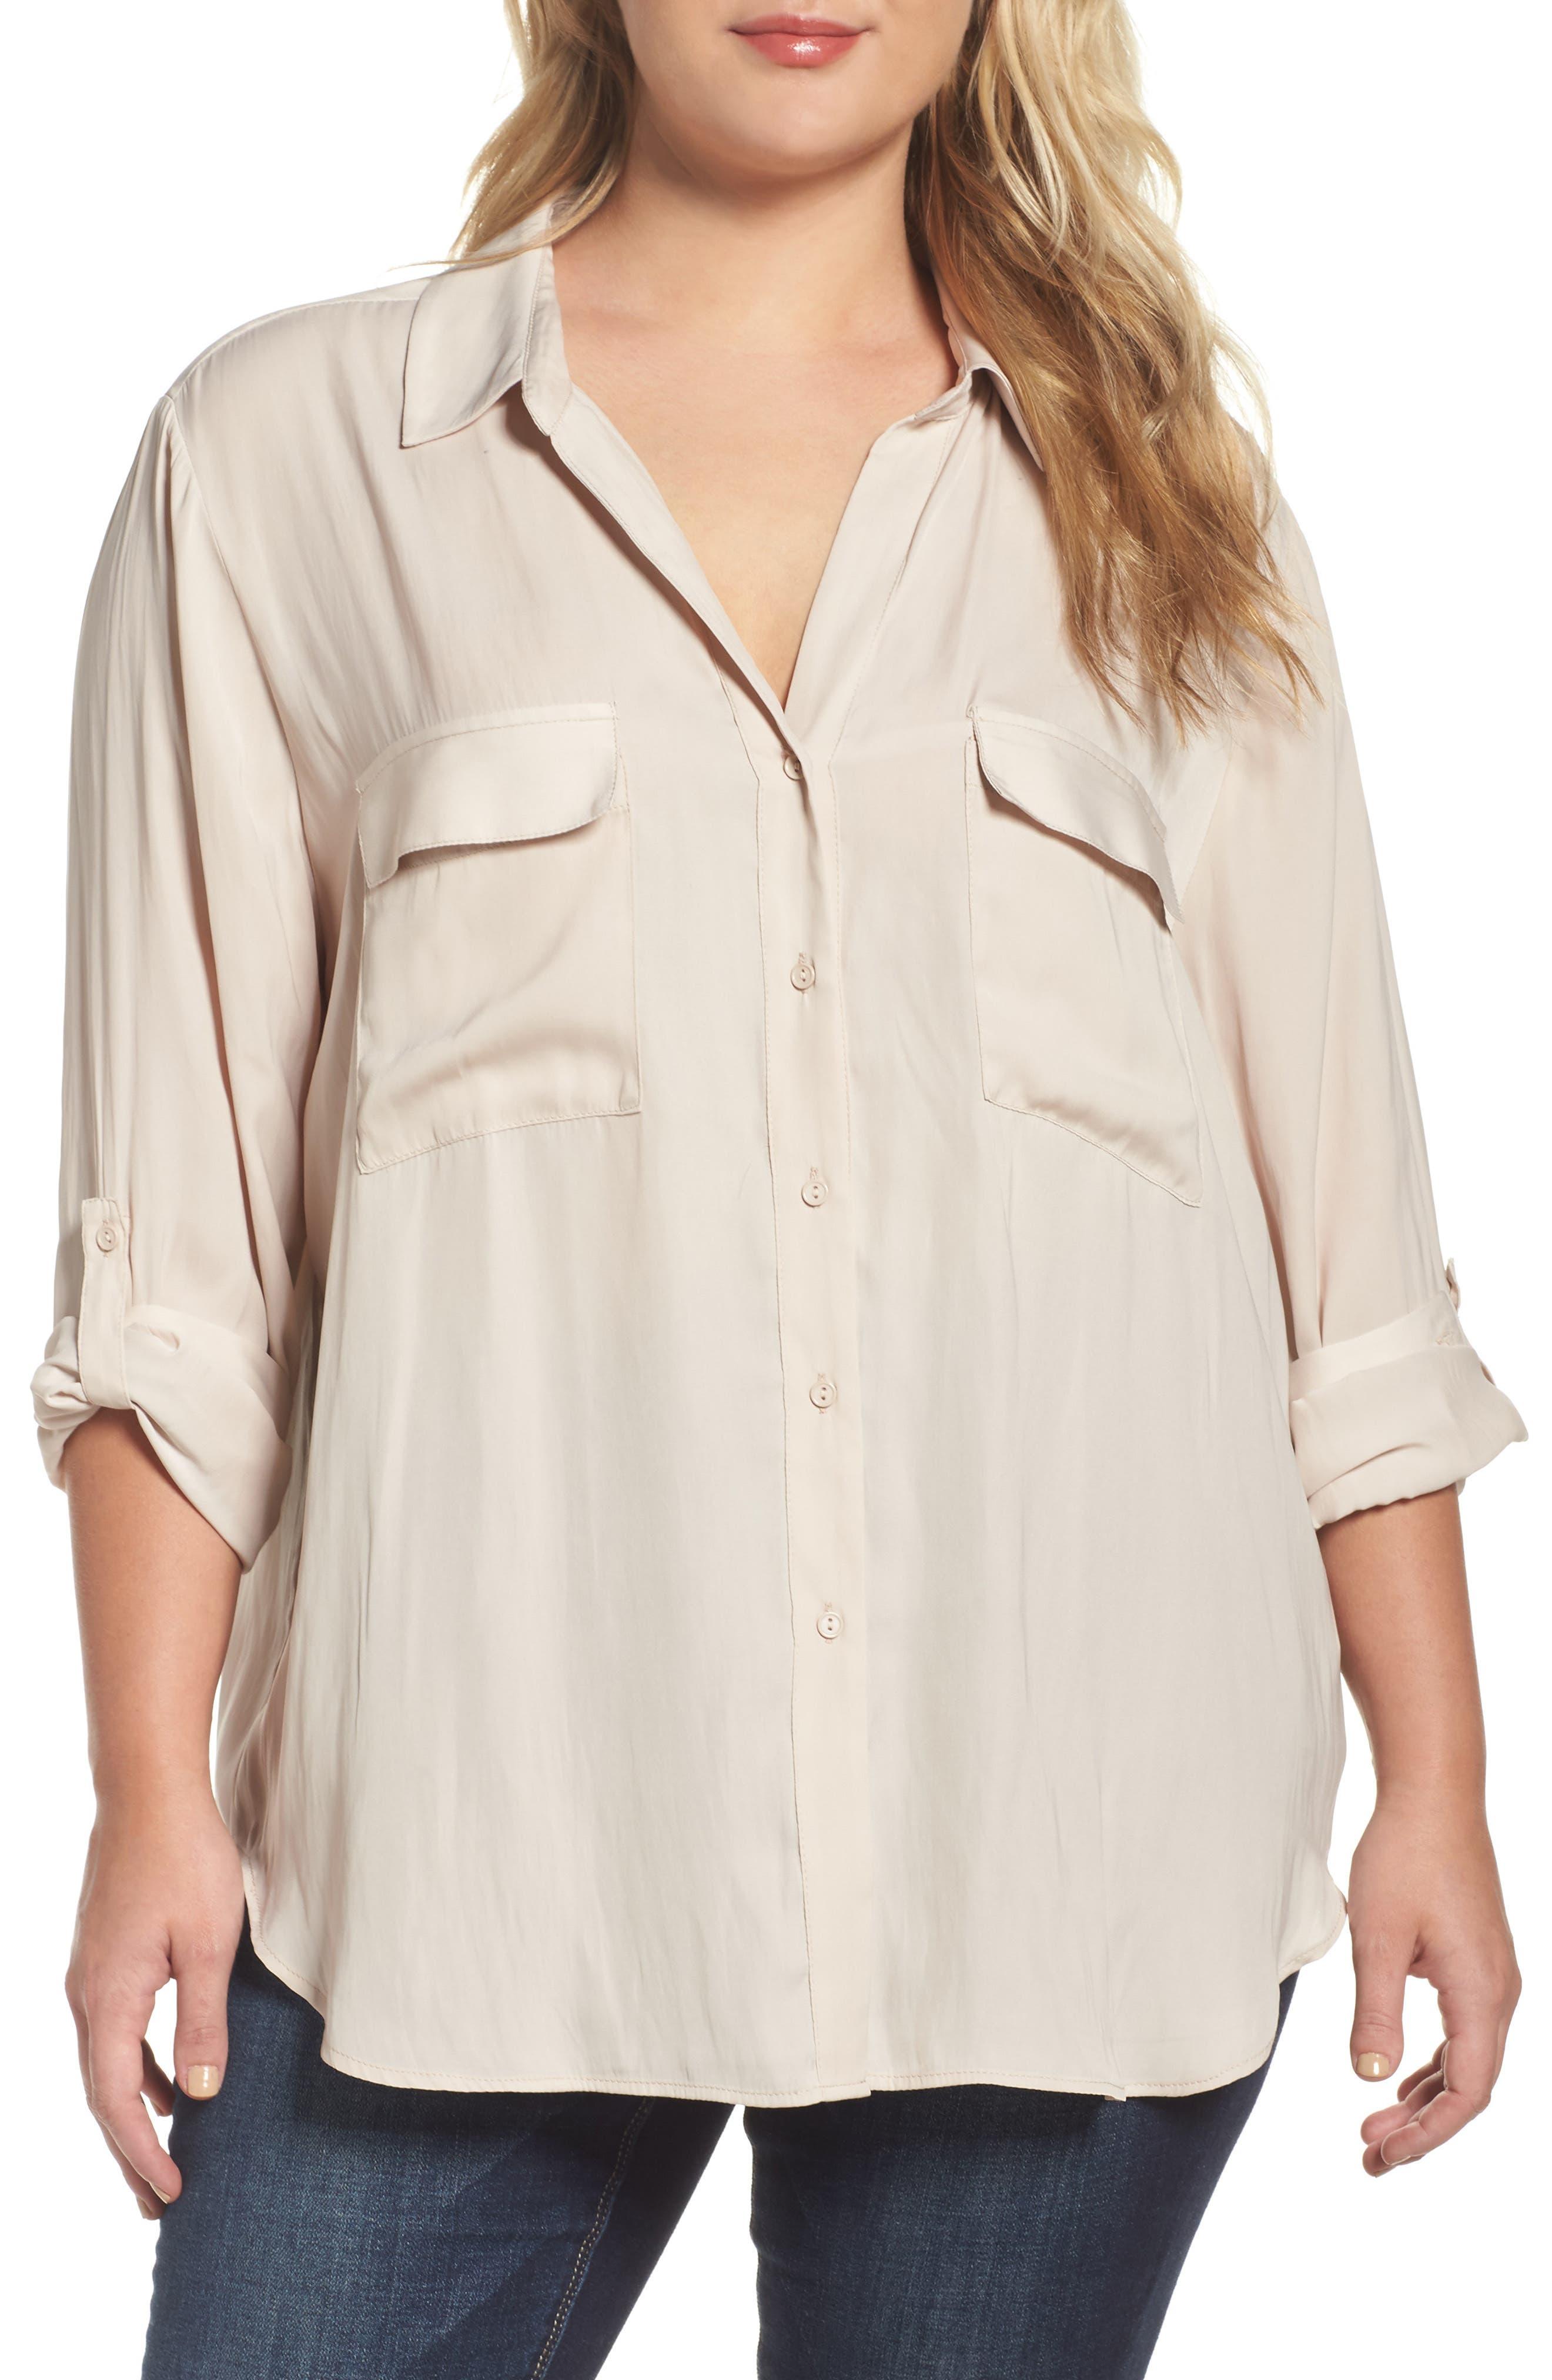 Tart Carol Roll-Sleeve Blouse (Plus Size)